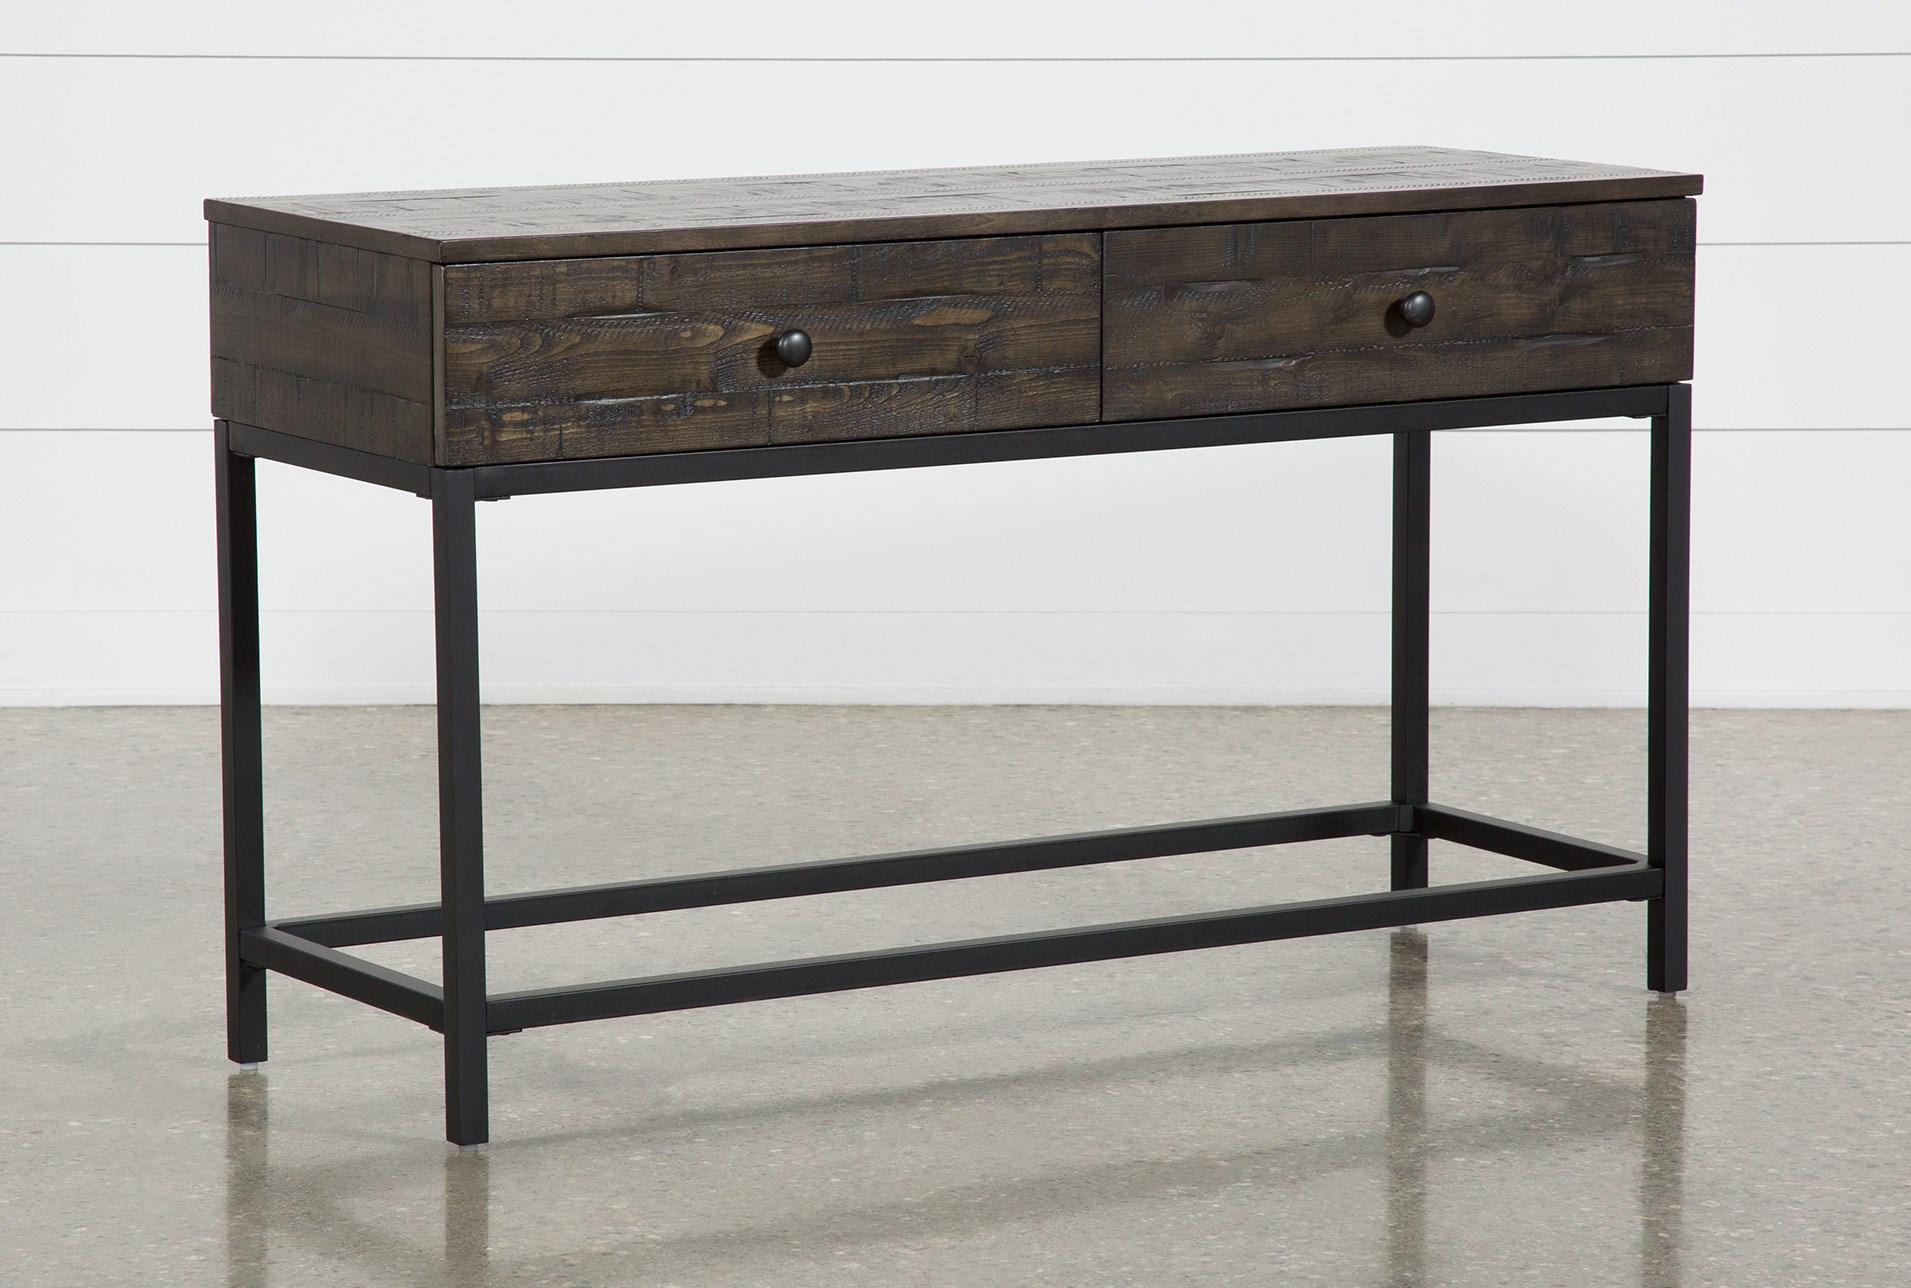 Surprising Wilson Sofa Table Andrewgaddart Wooden Chair Designs For Living Room Andrewgaddartcom